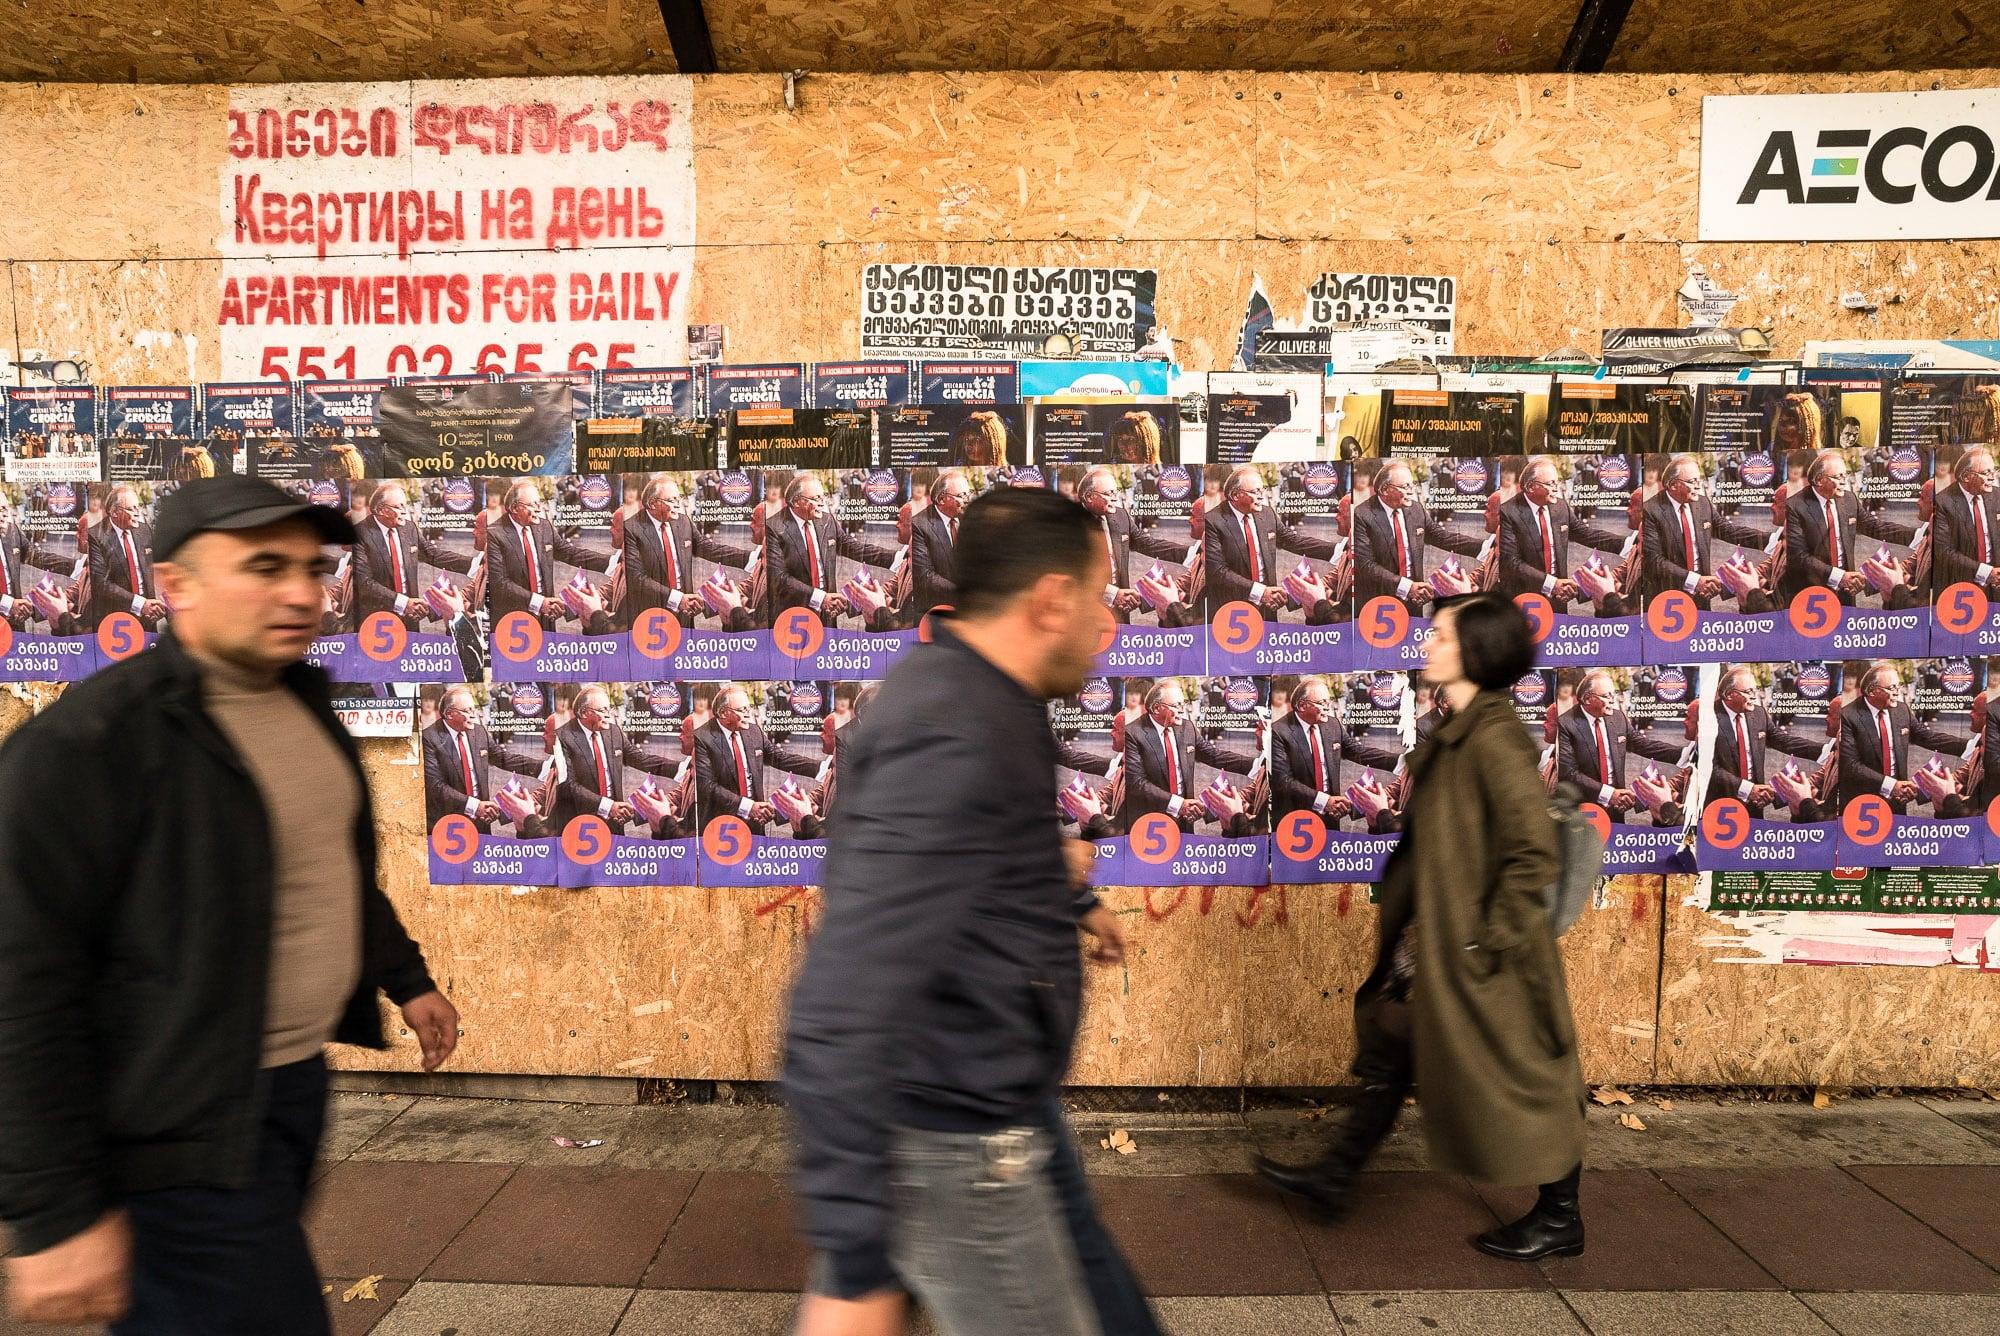 political ads in Tbilisi